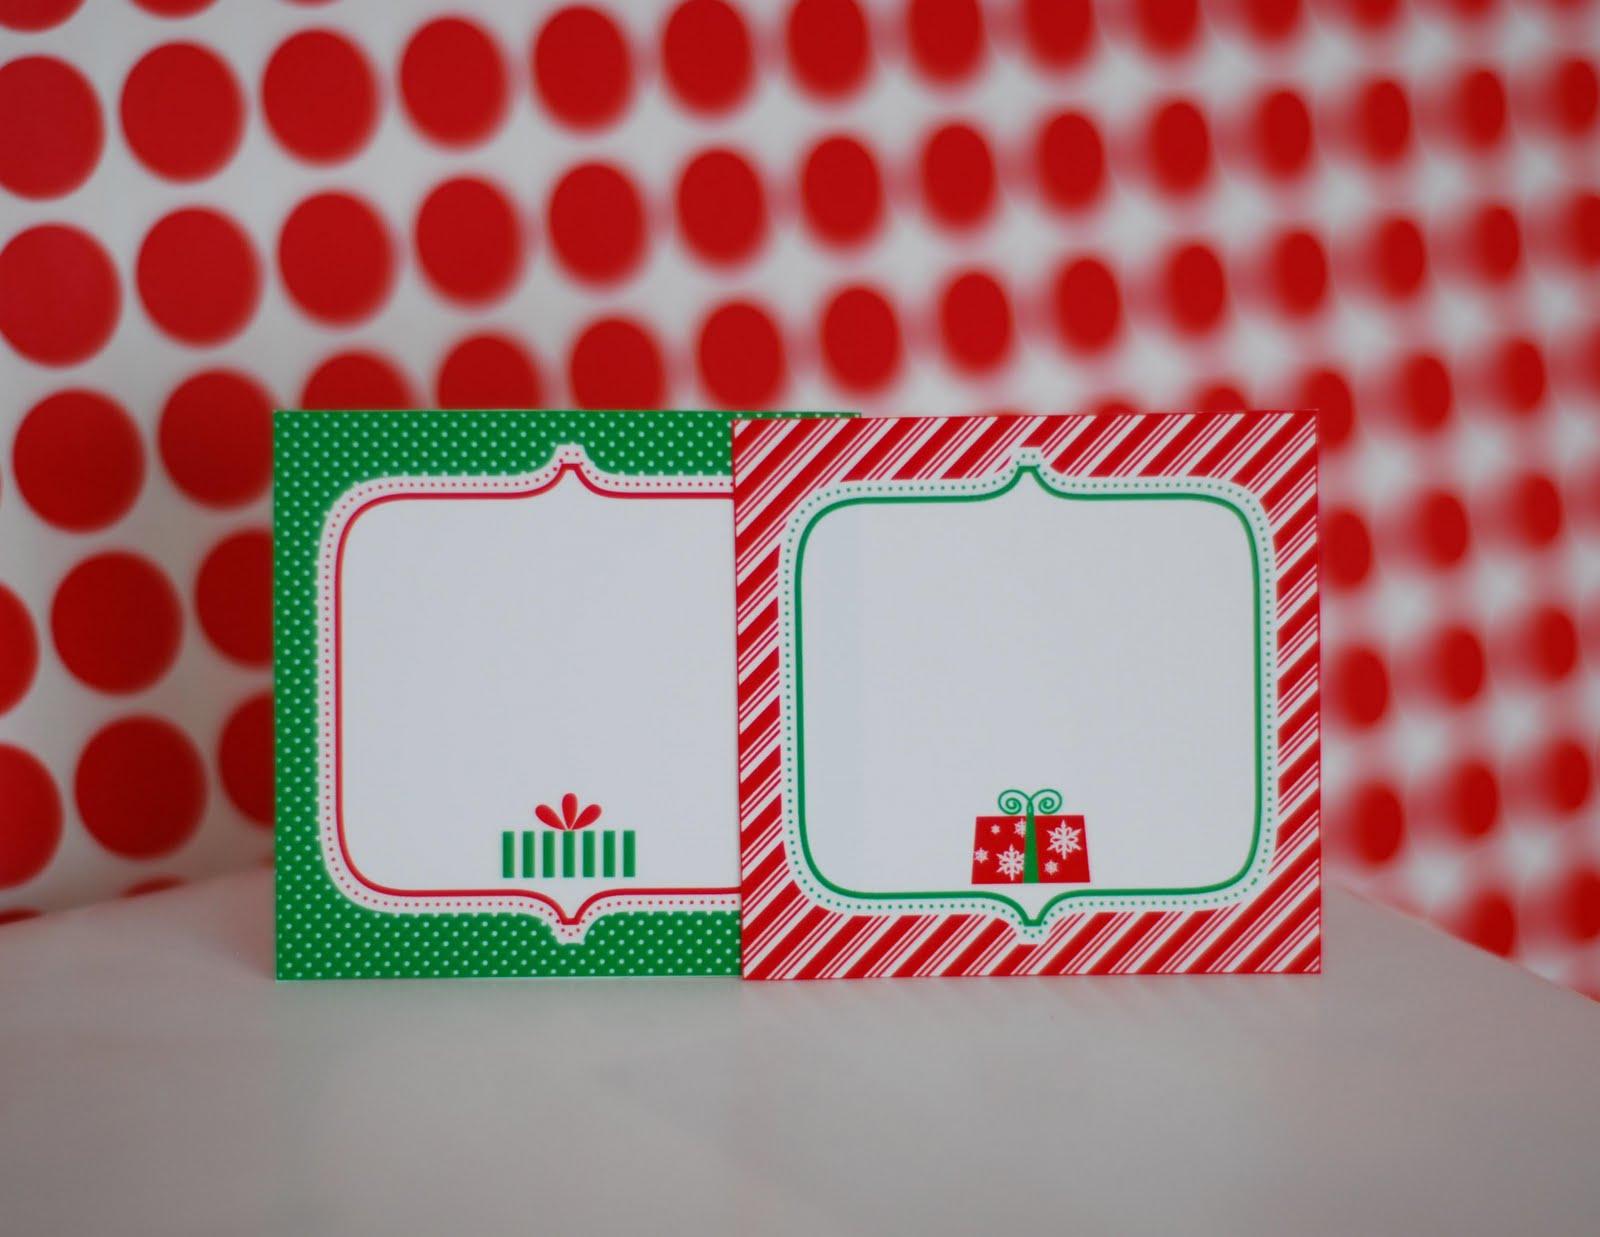 Free Printable: Letter To Santa, Wish List And Gift Tags! - Anders - Free Printable Christmas Food Labels